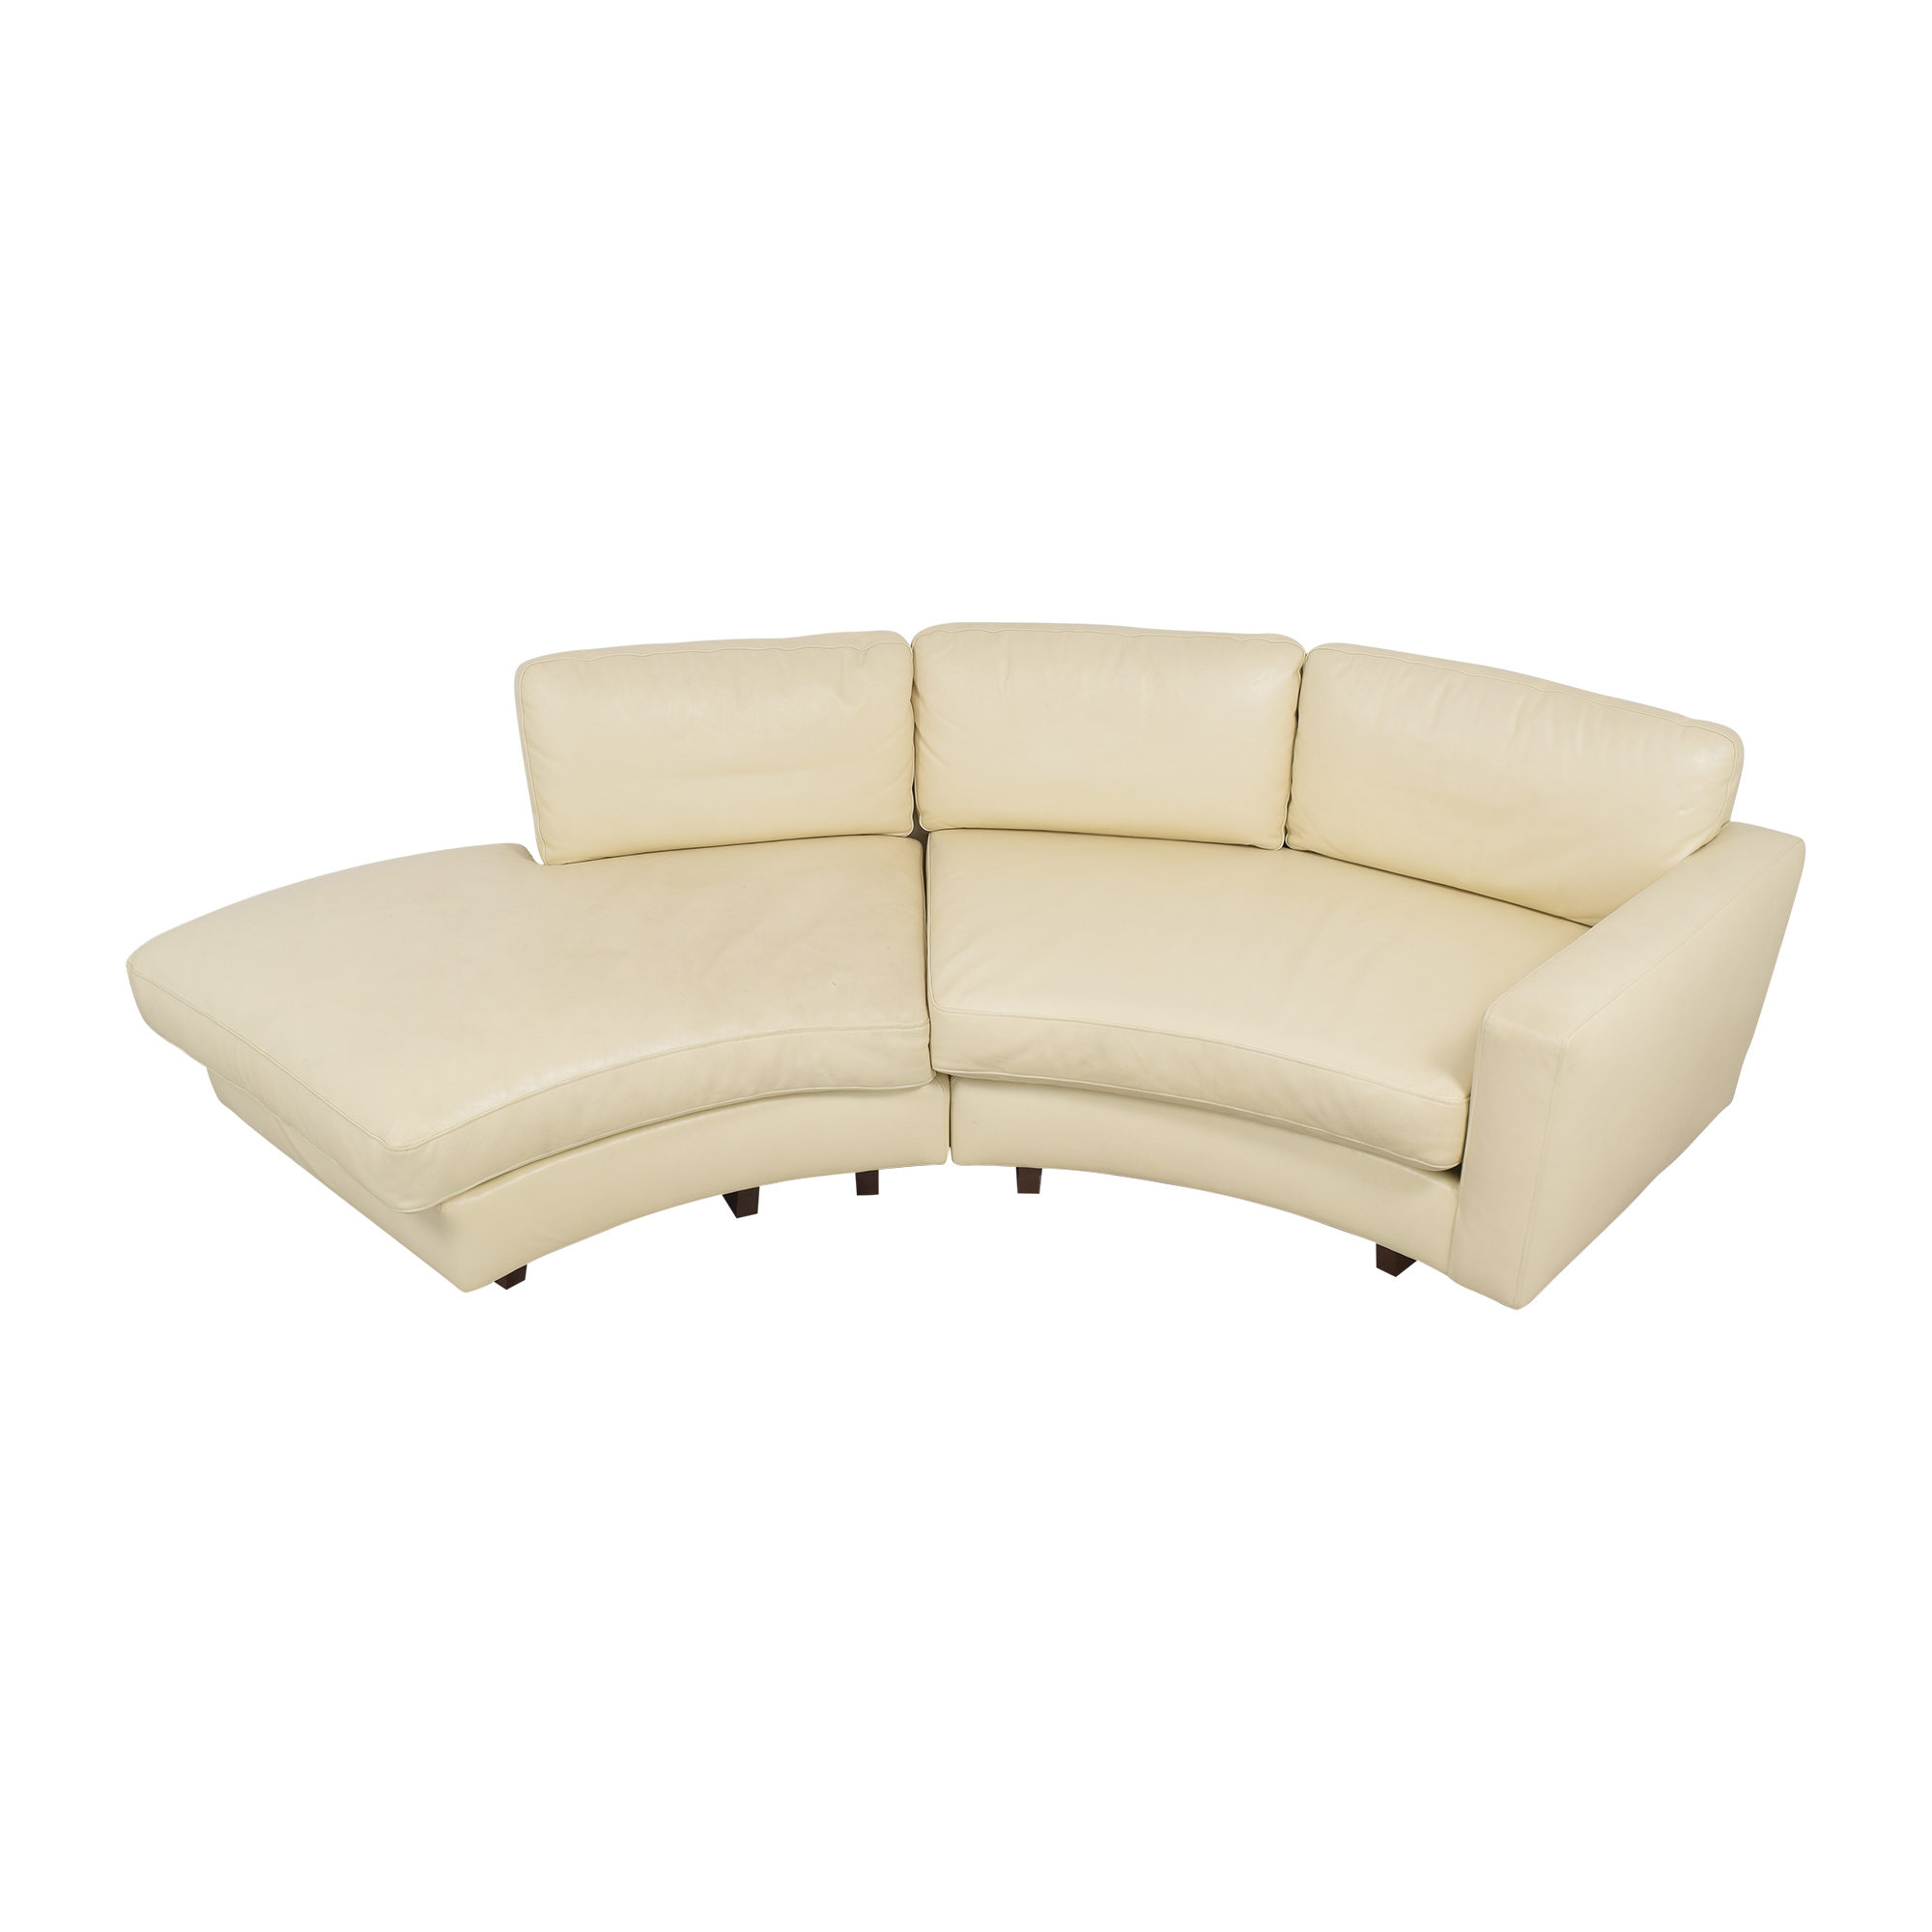 shop Thayer Coggin Thayer Coggin Clip 2 Sectional Sofa online